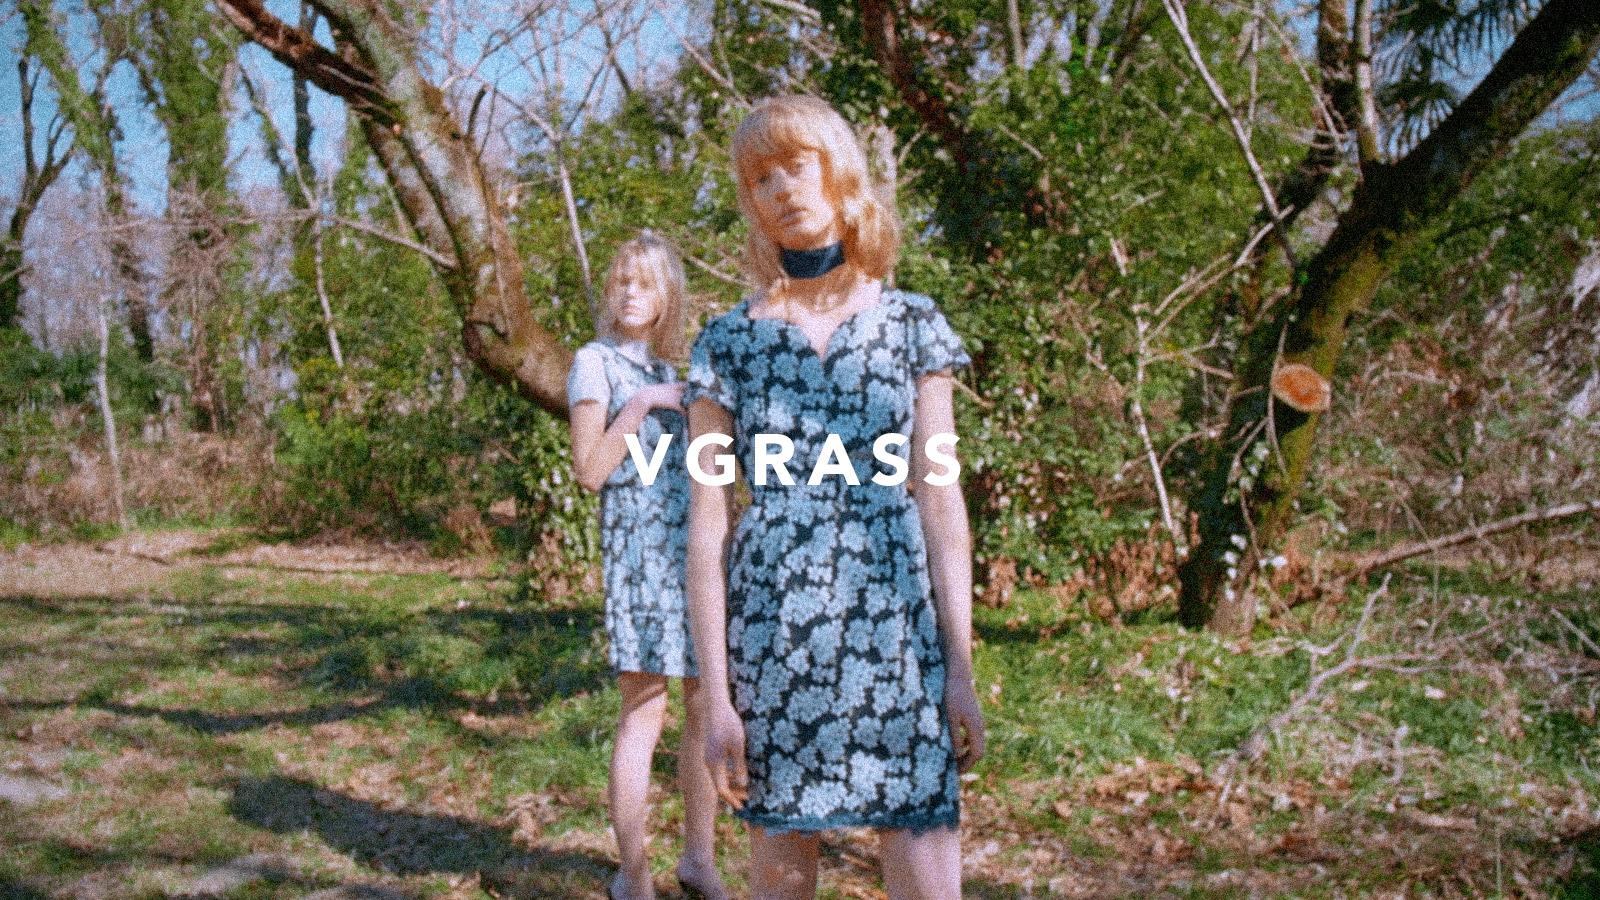 VGRASS 2017 S/S PROMOTION MOVIE